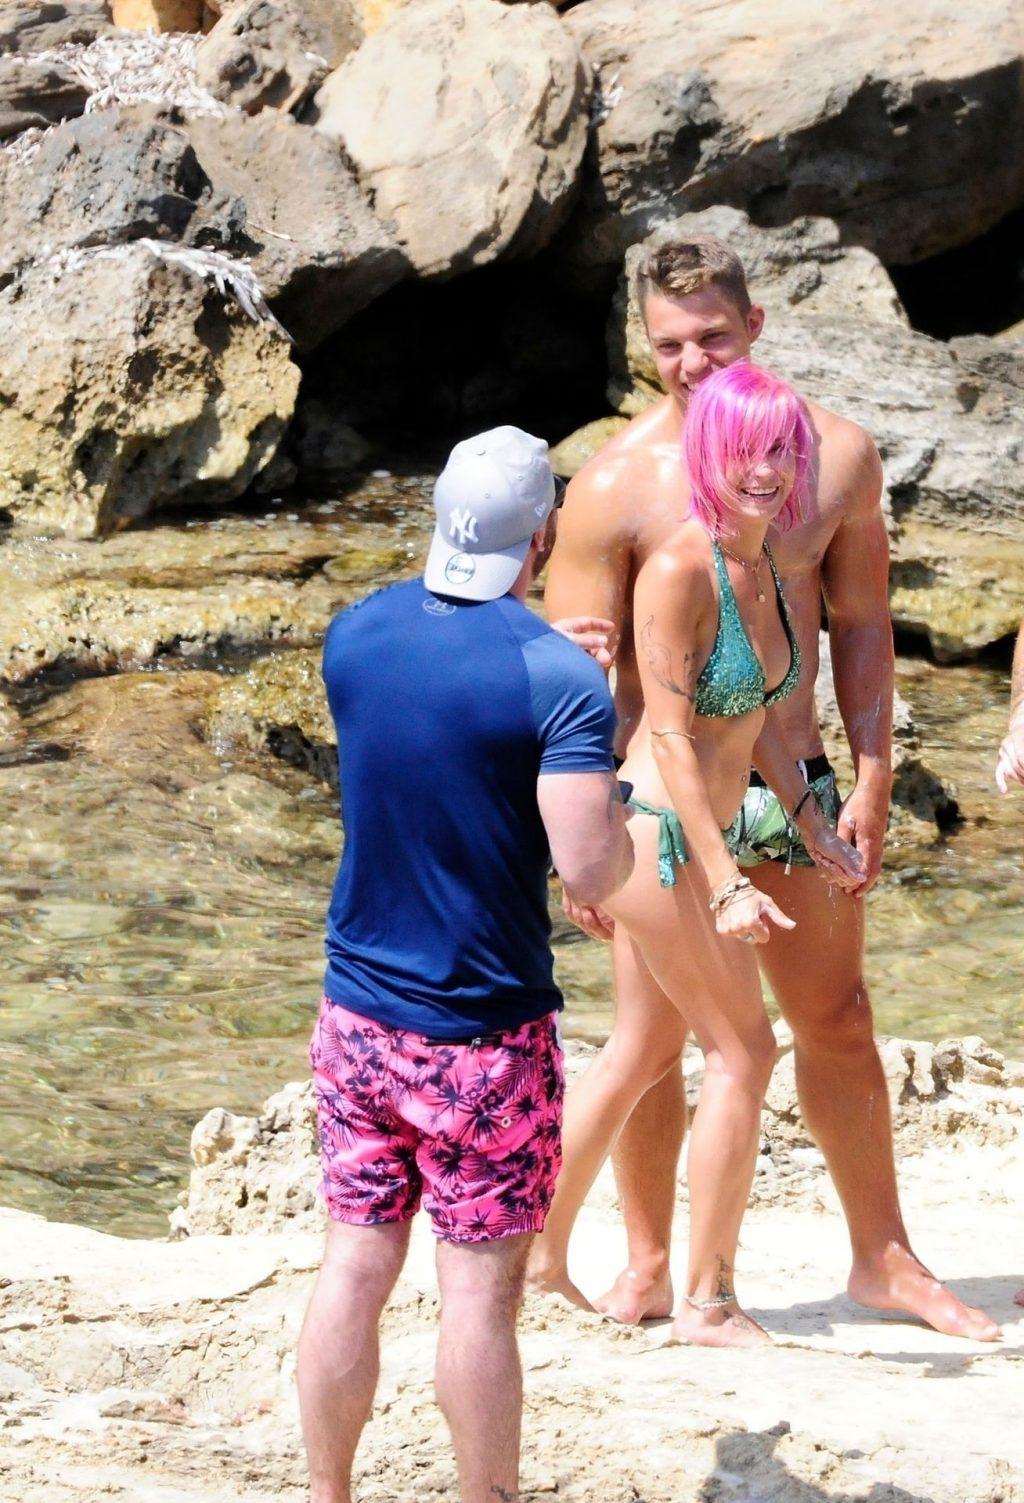 Topless Mia Julia Brückner Enjoy a Day on the Beach in Palma (44 Photos)